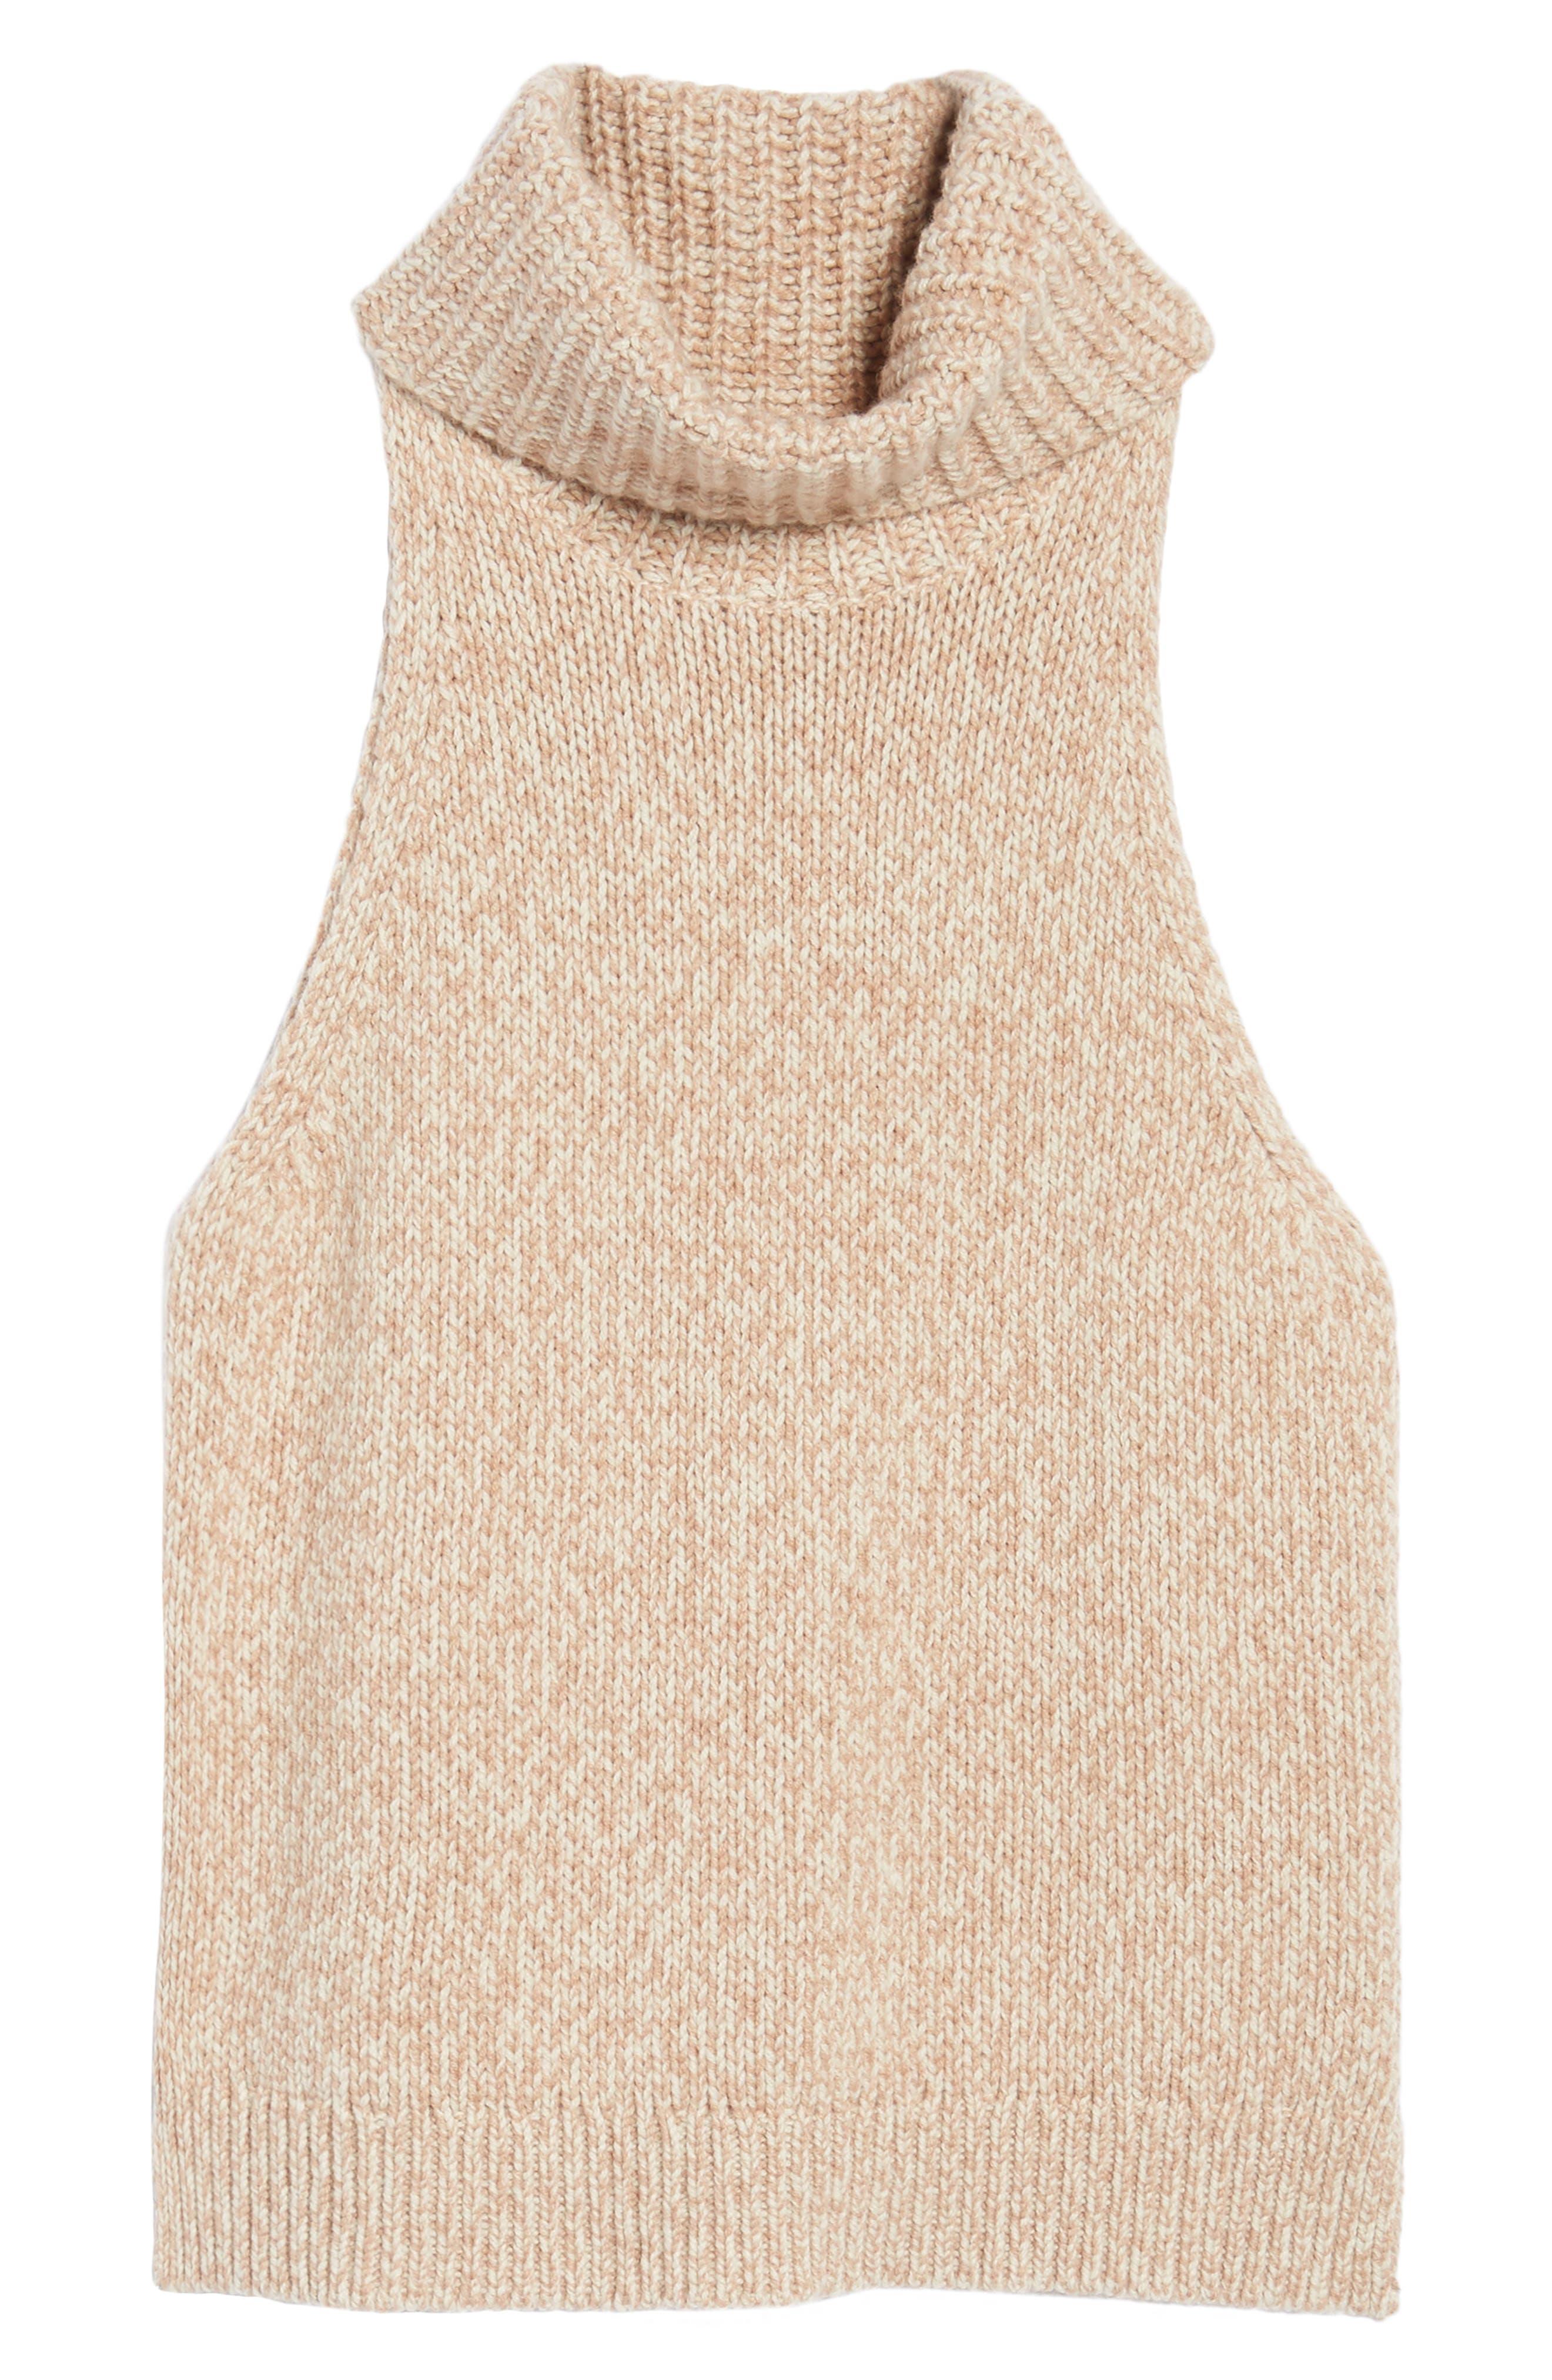 Marled Sleeveless Turtleneck Sweater,                             Alternate thumbnail 6, color,                             201